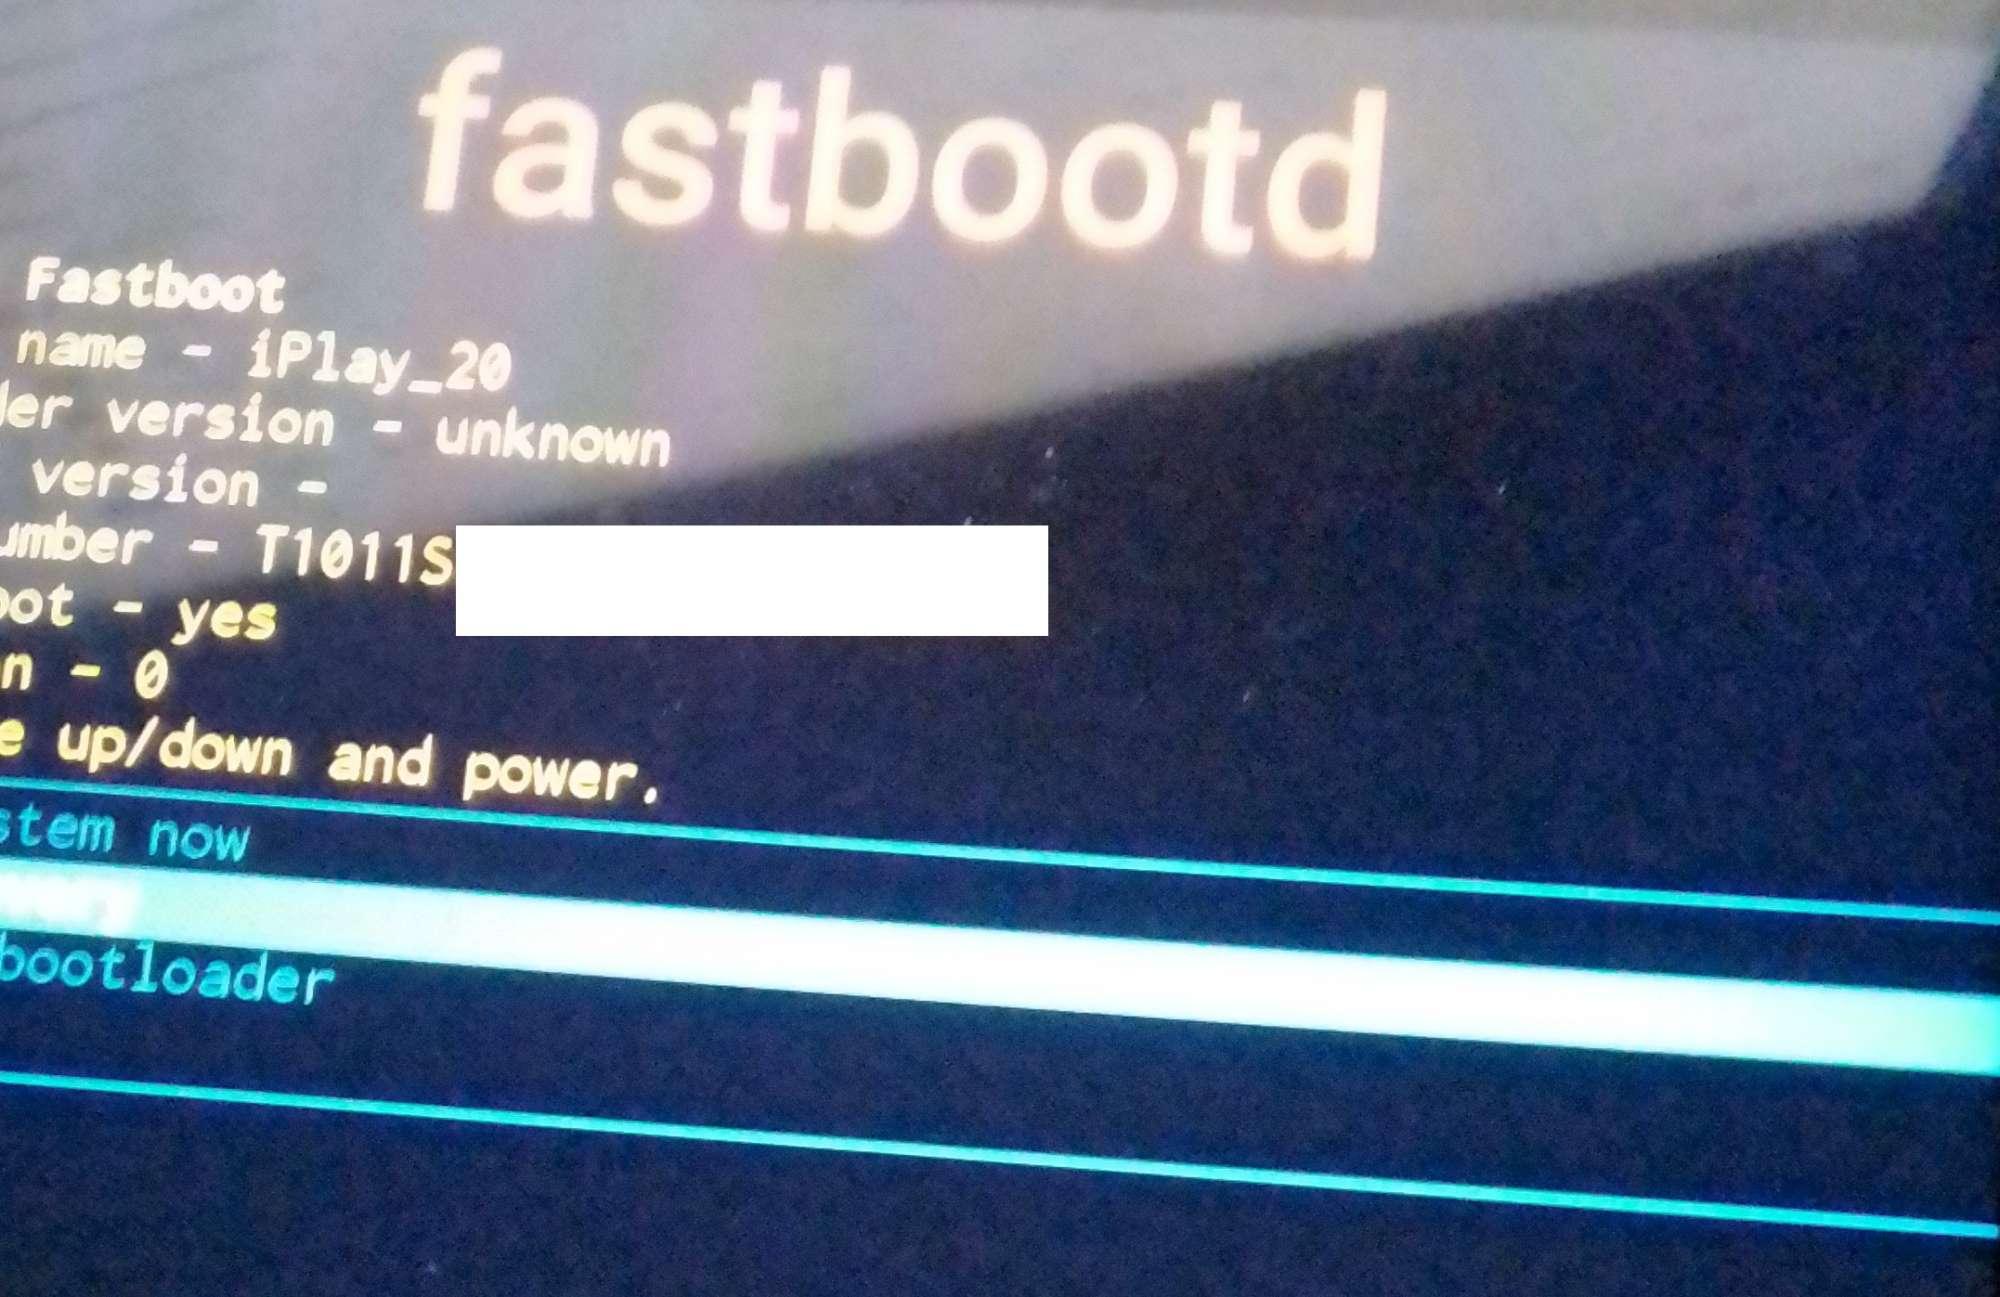 fastbootd